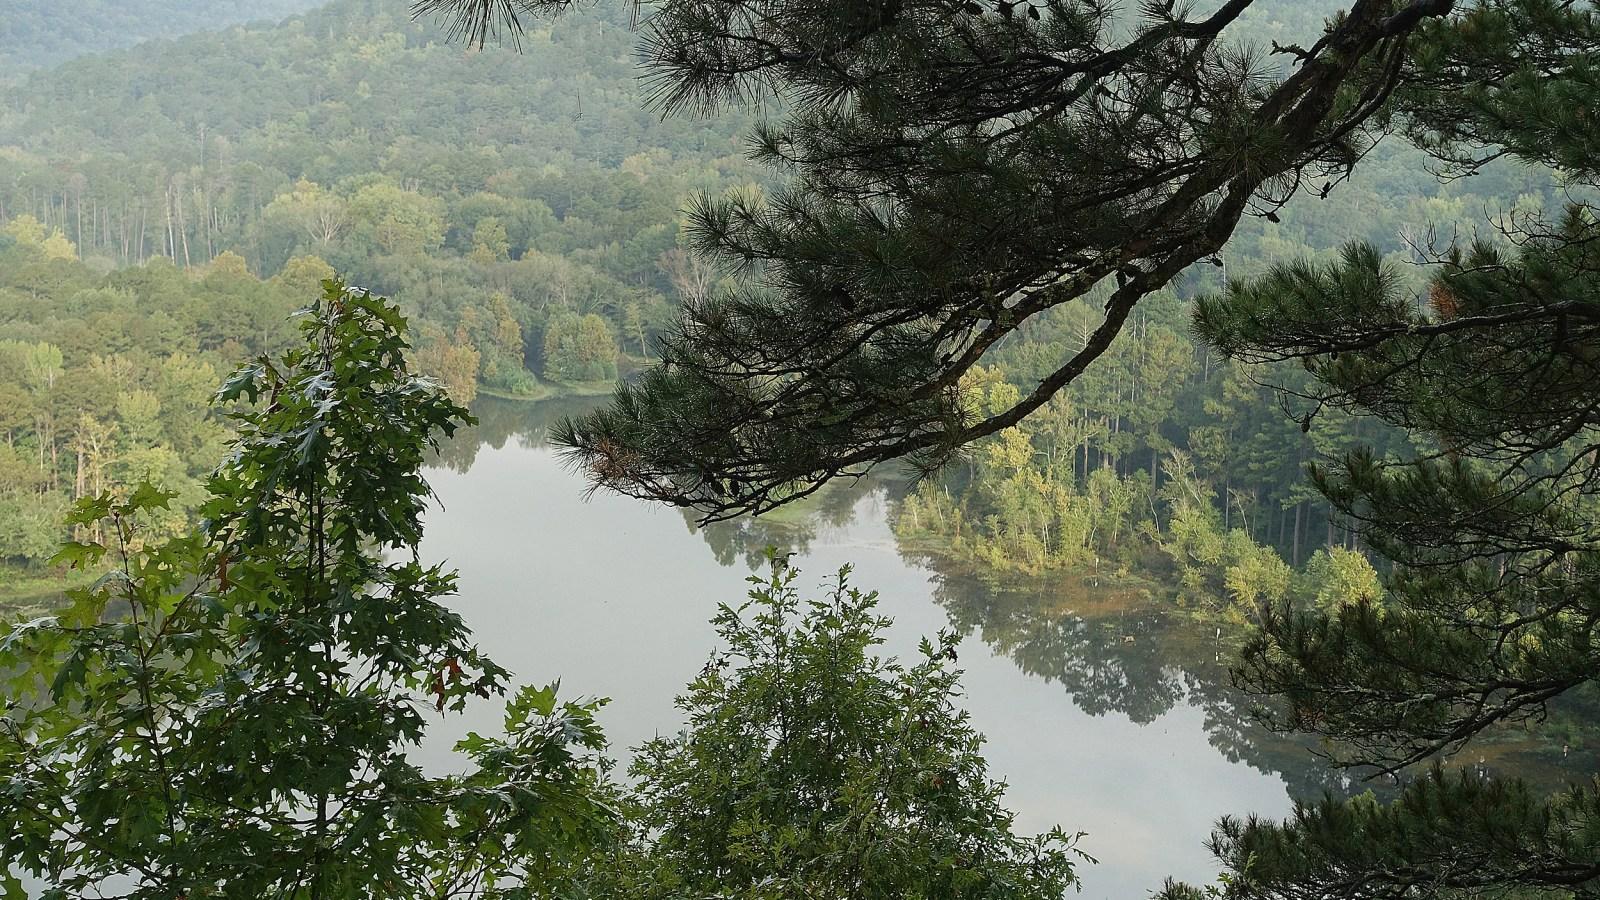 The Ozark National Forest in Arkansas.